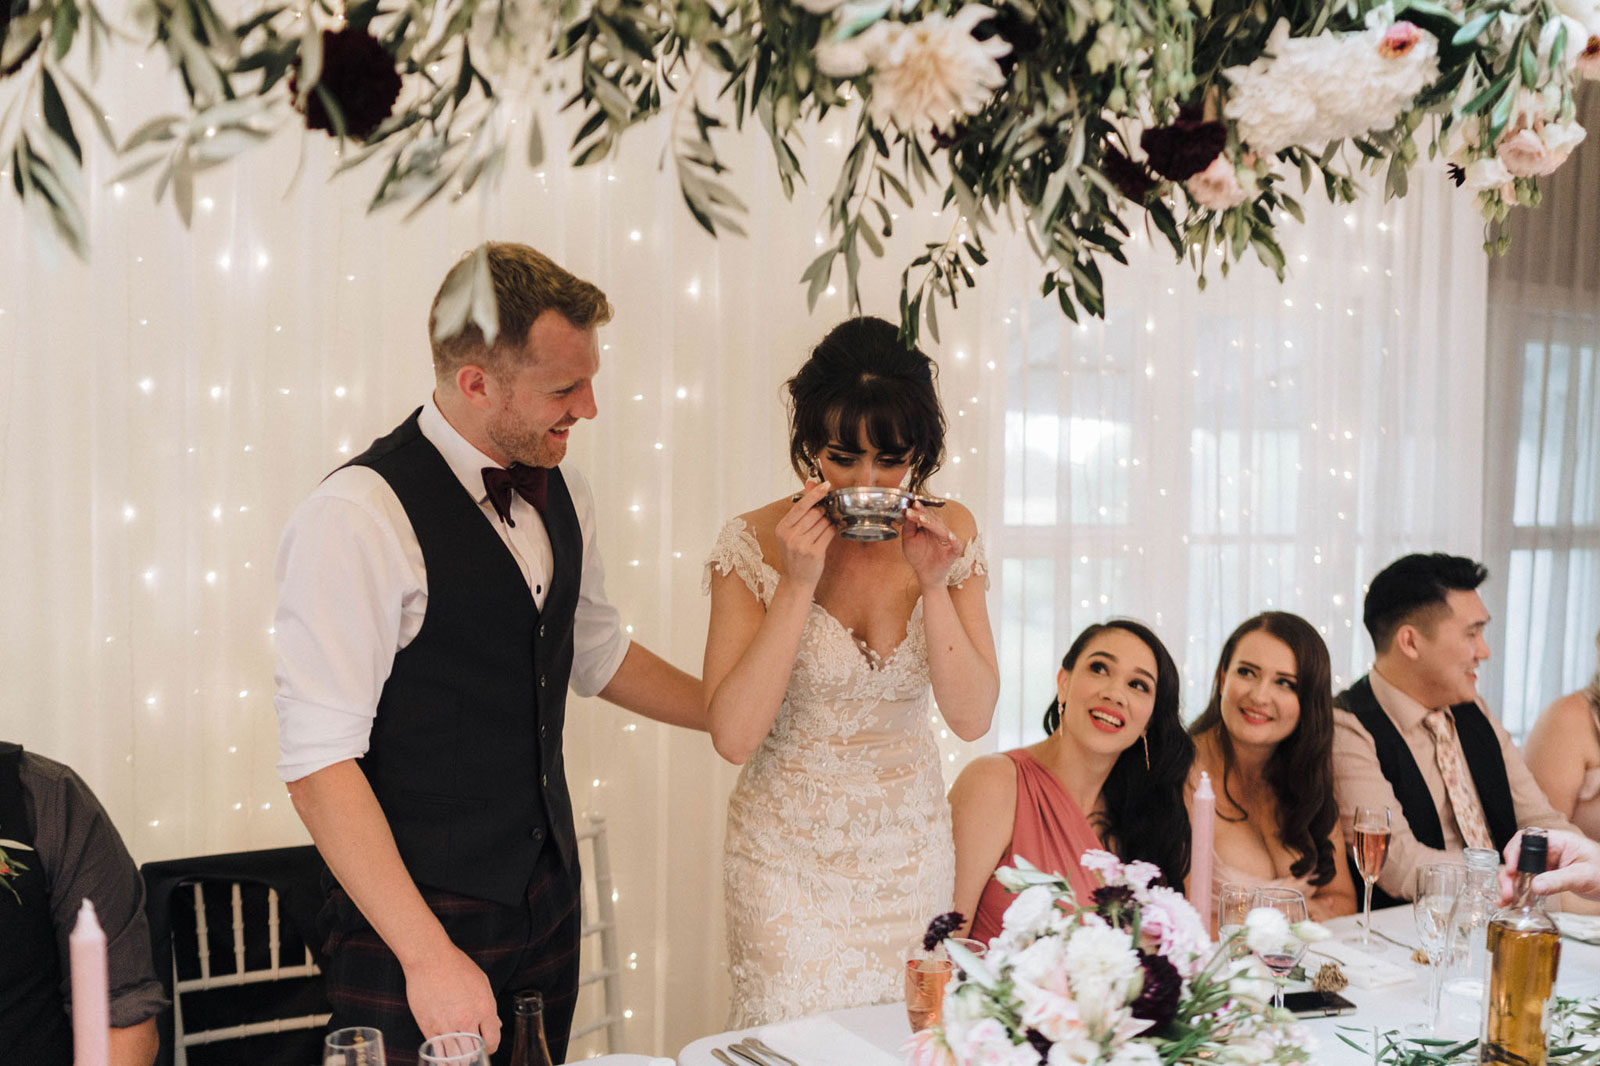 newfound-n-c-olive-tree-cottage-tauranga-wedding-photographer-1049